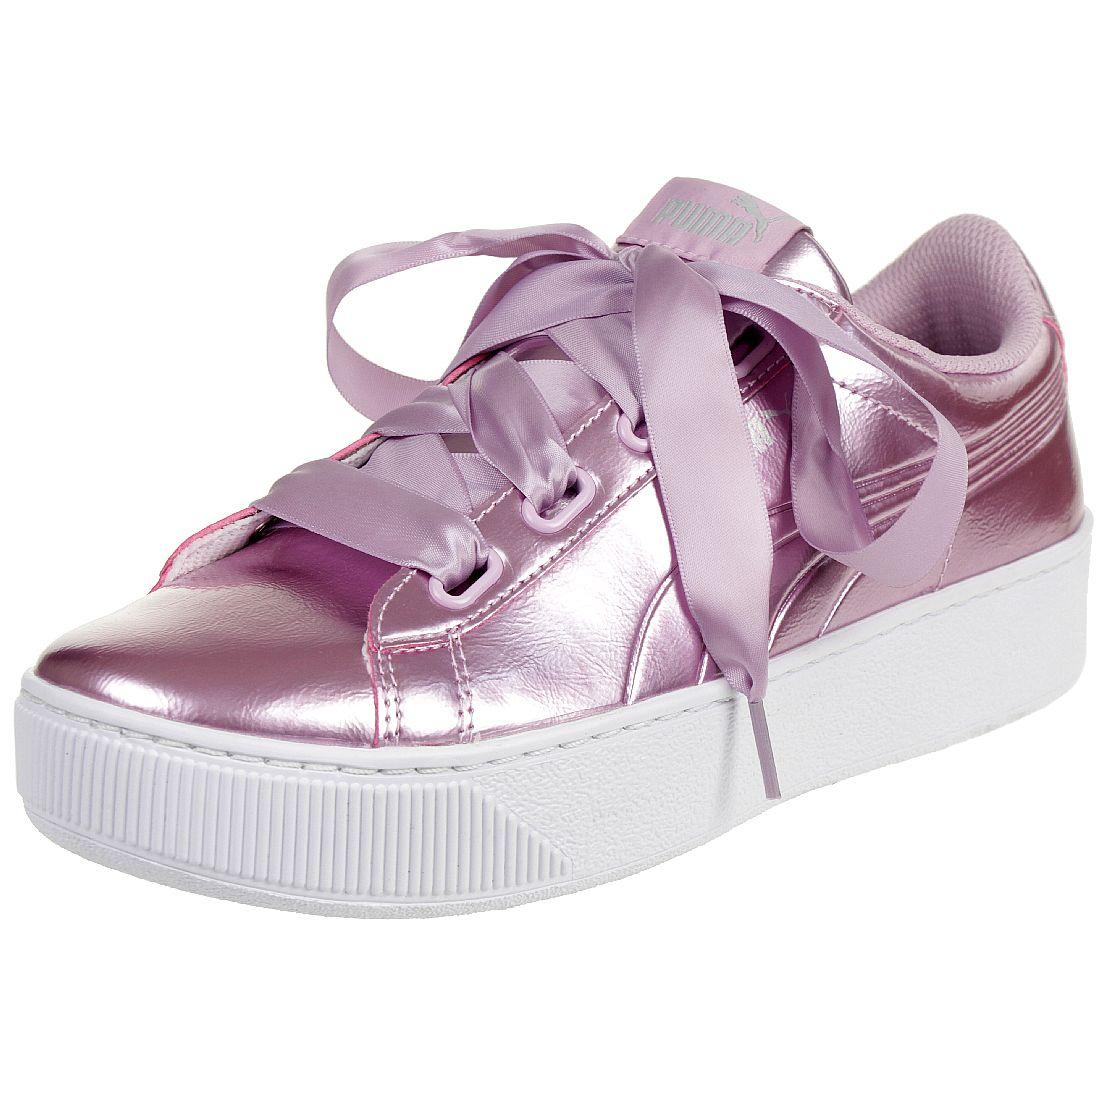 cc389e610f56dc Puma Vikky Platform Ribbon P Sneaker Damen Schuhe 366419 04 pink ...